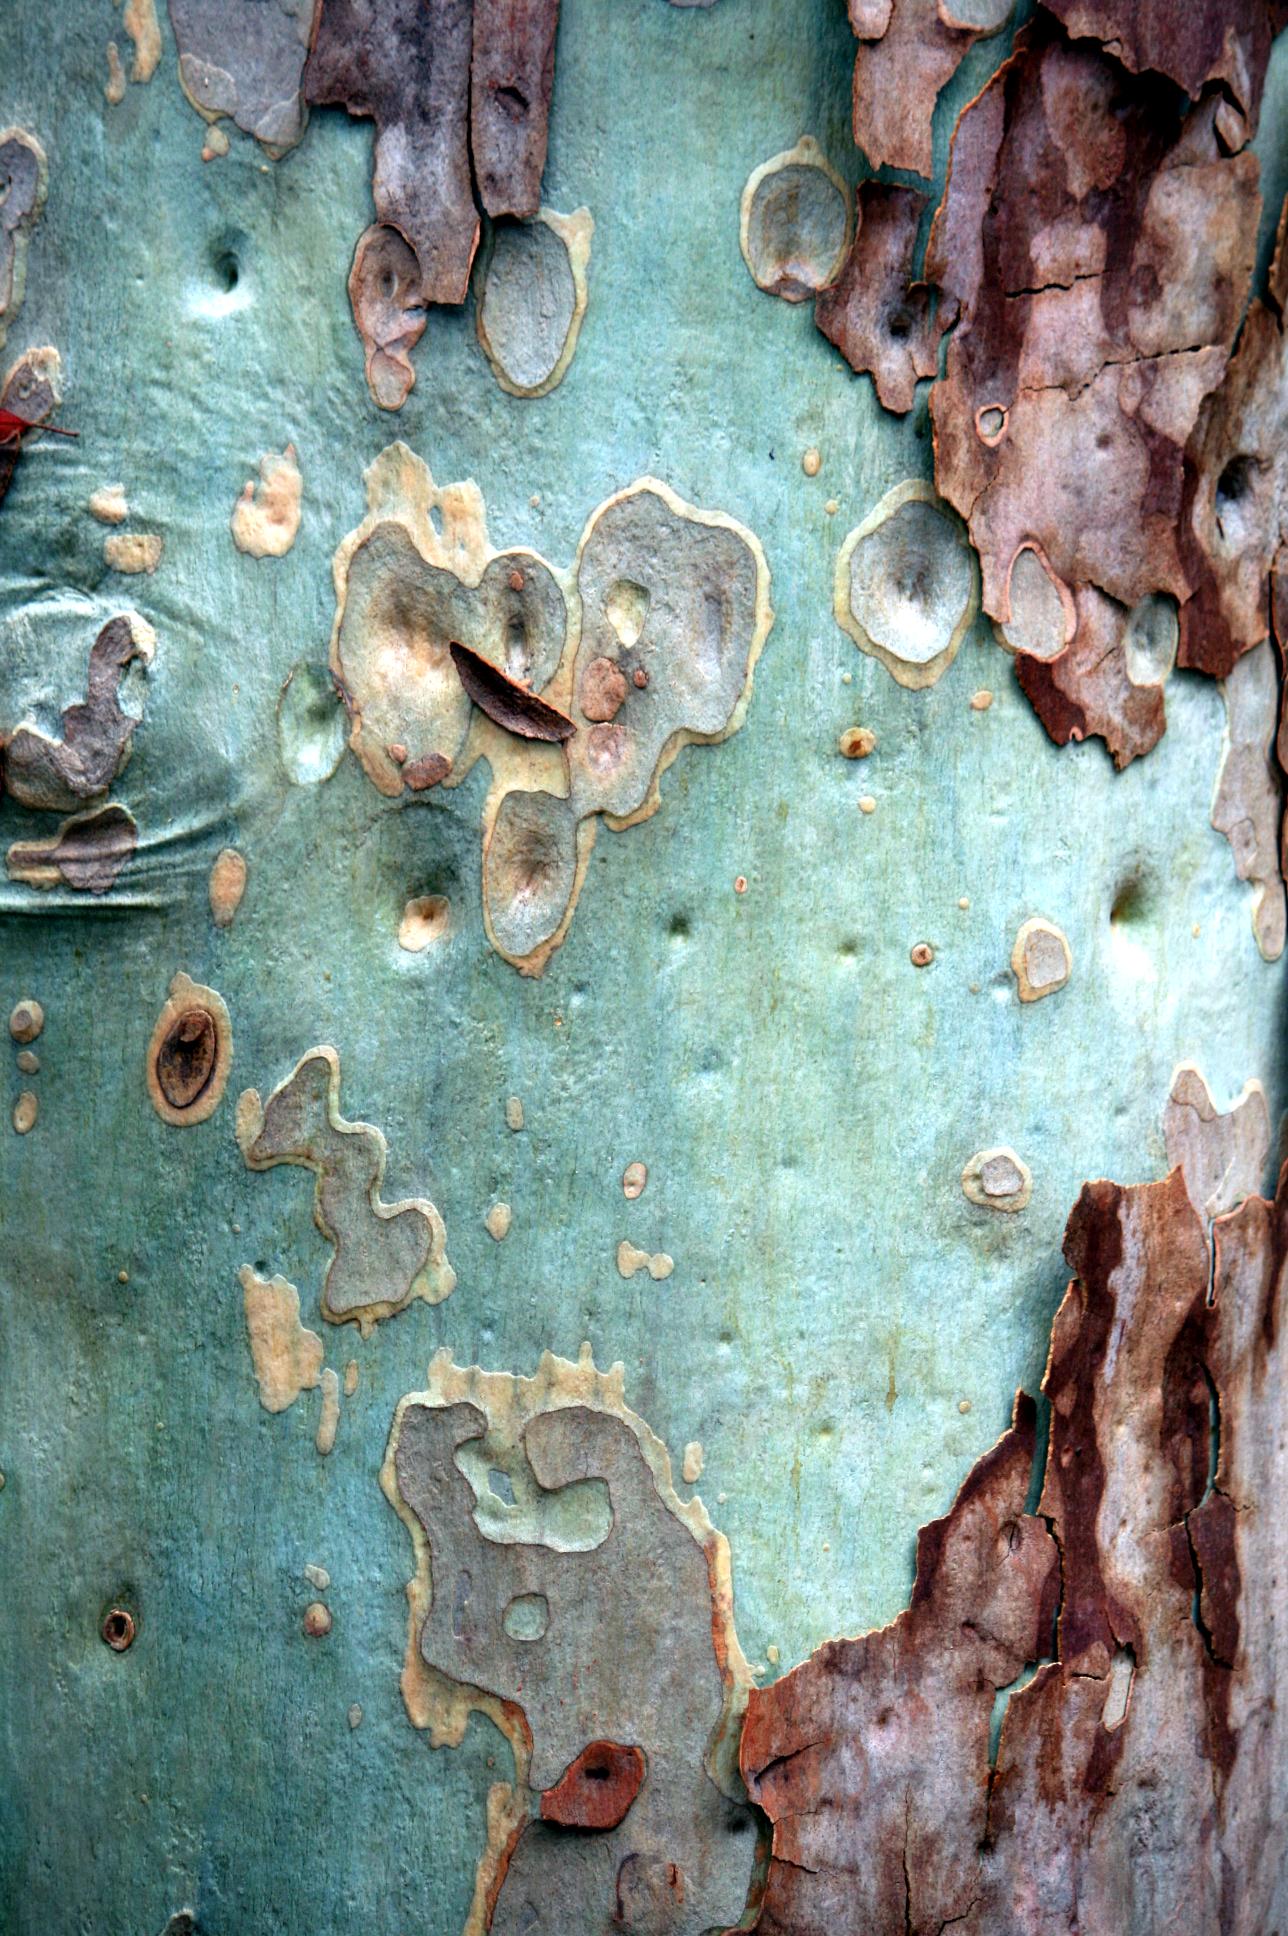 Beauty in nature - eucalyptus bark - art surface, texture, pattern, colour                                                                                                                                                      More